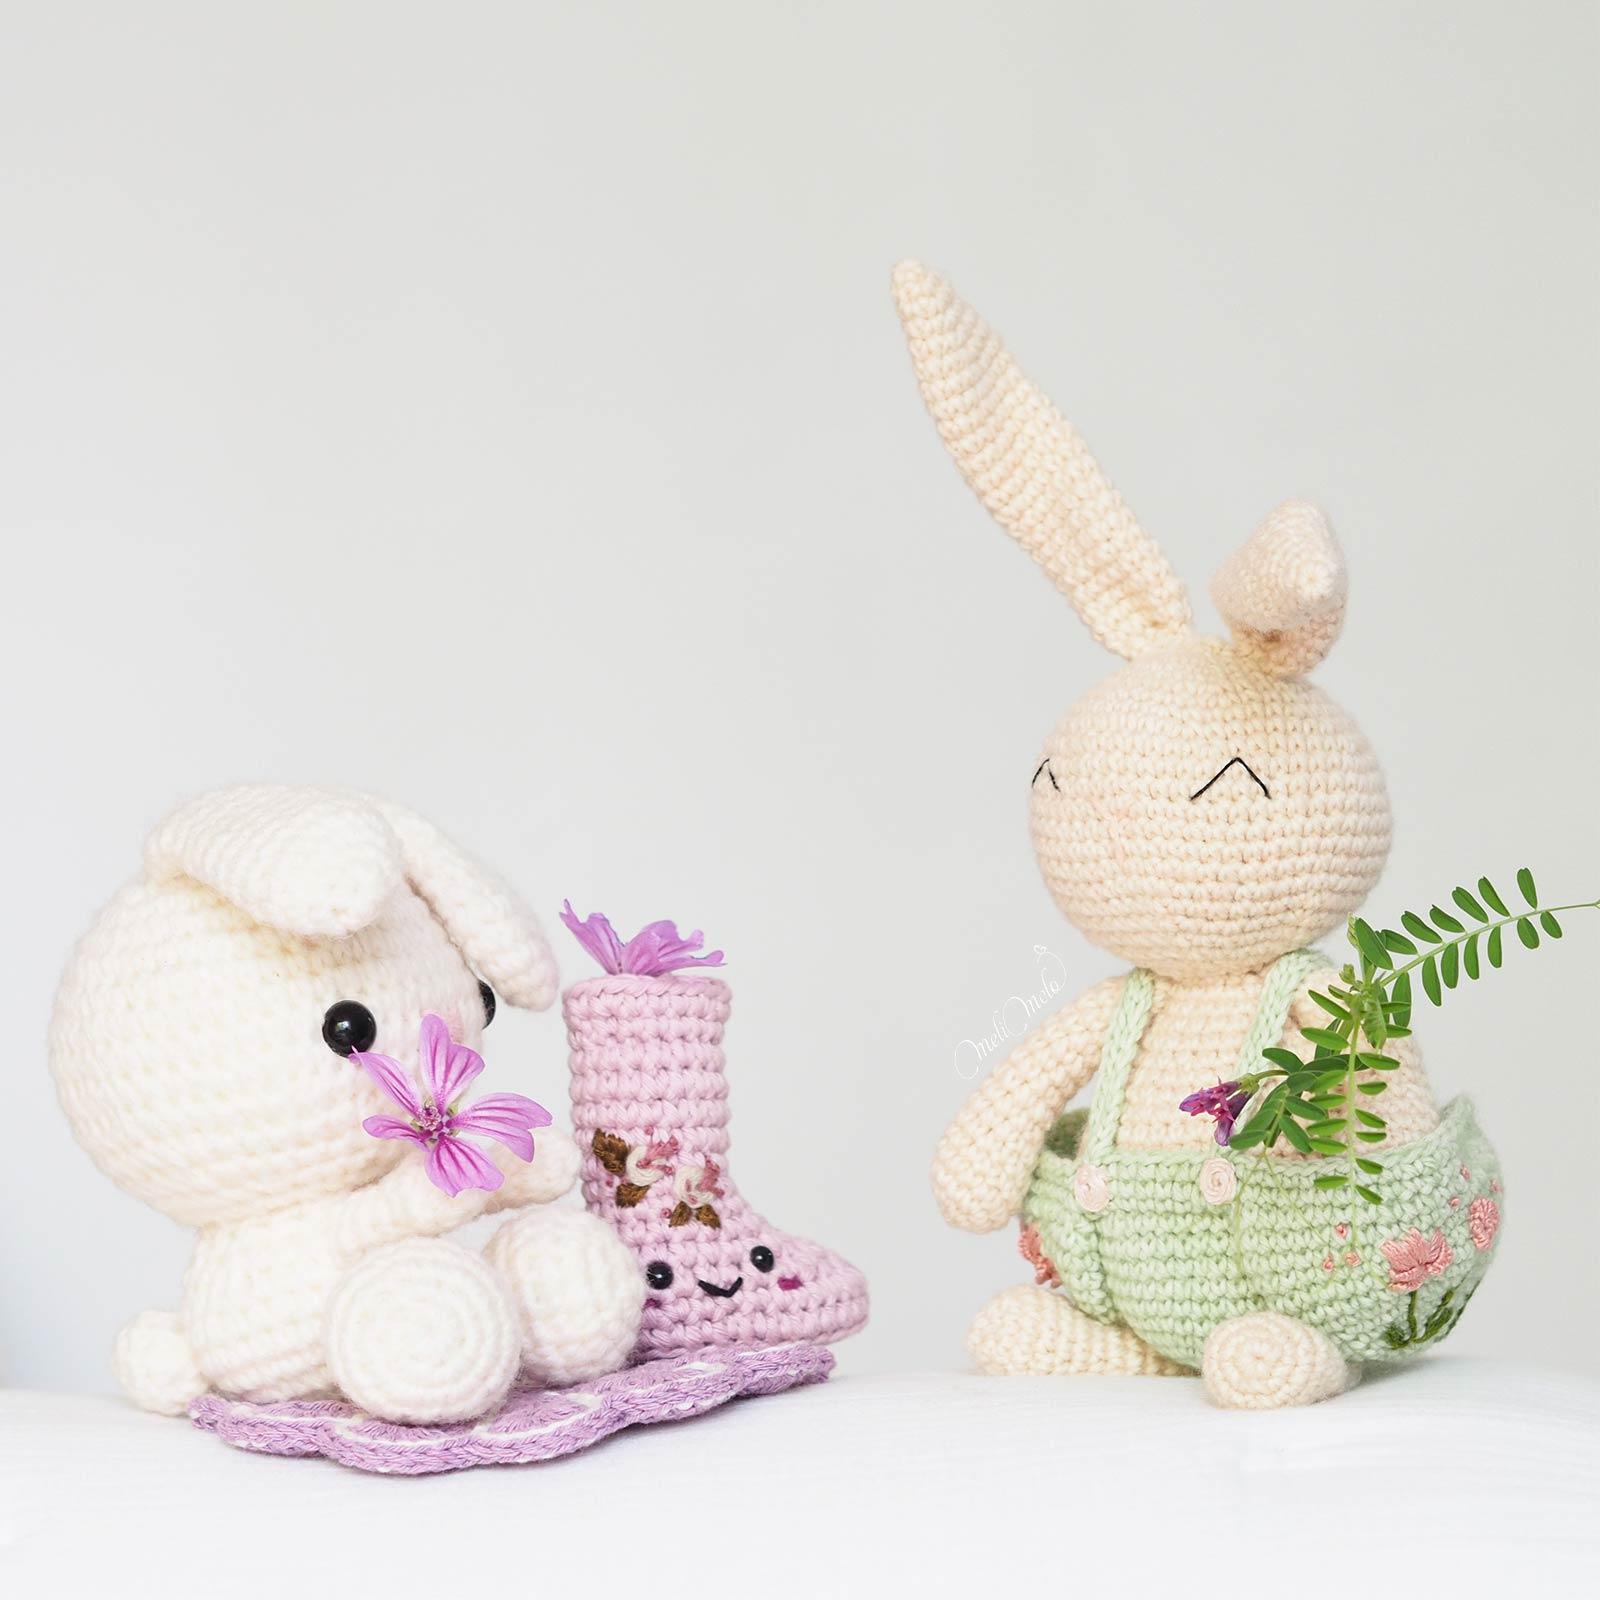 lapins-mignons-kawaii-crochet-amigurumi-laboutiquedemelimelo